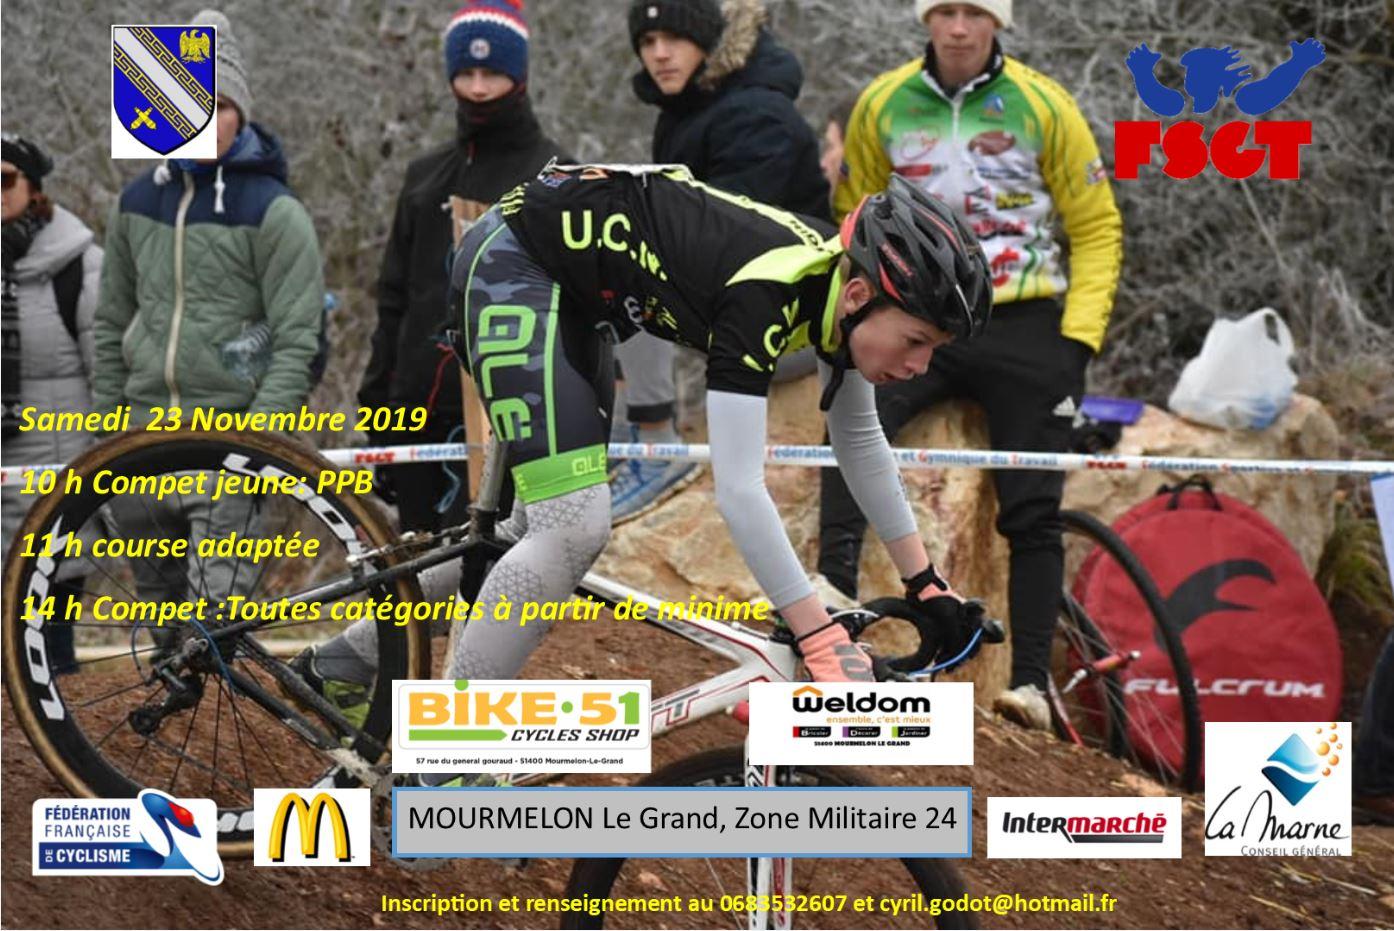 Calendrier Fsgt Cyclisme 2019.Commission Cycliste De L Aube Fsgt